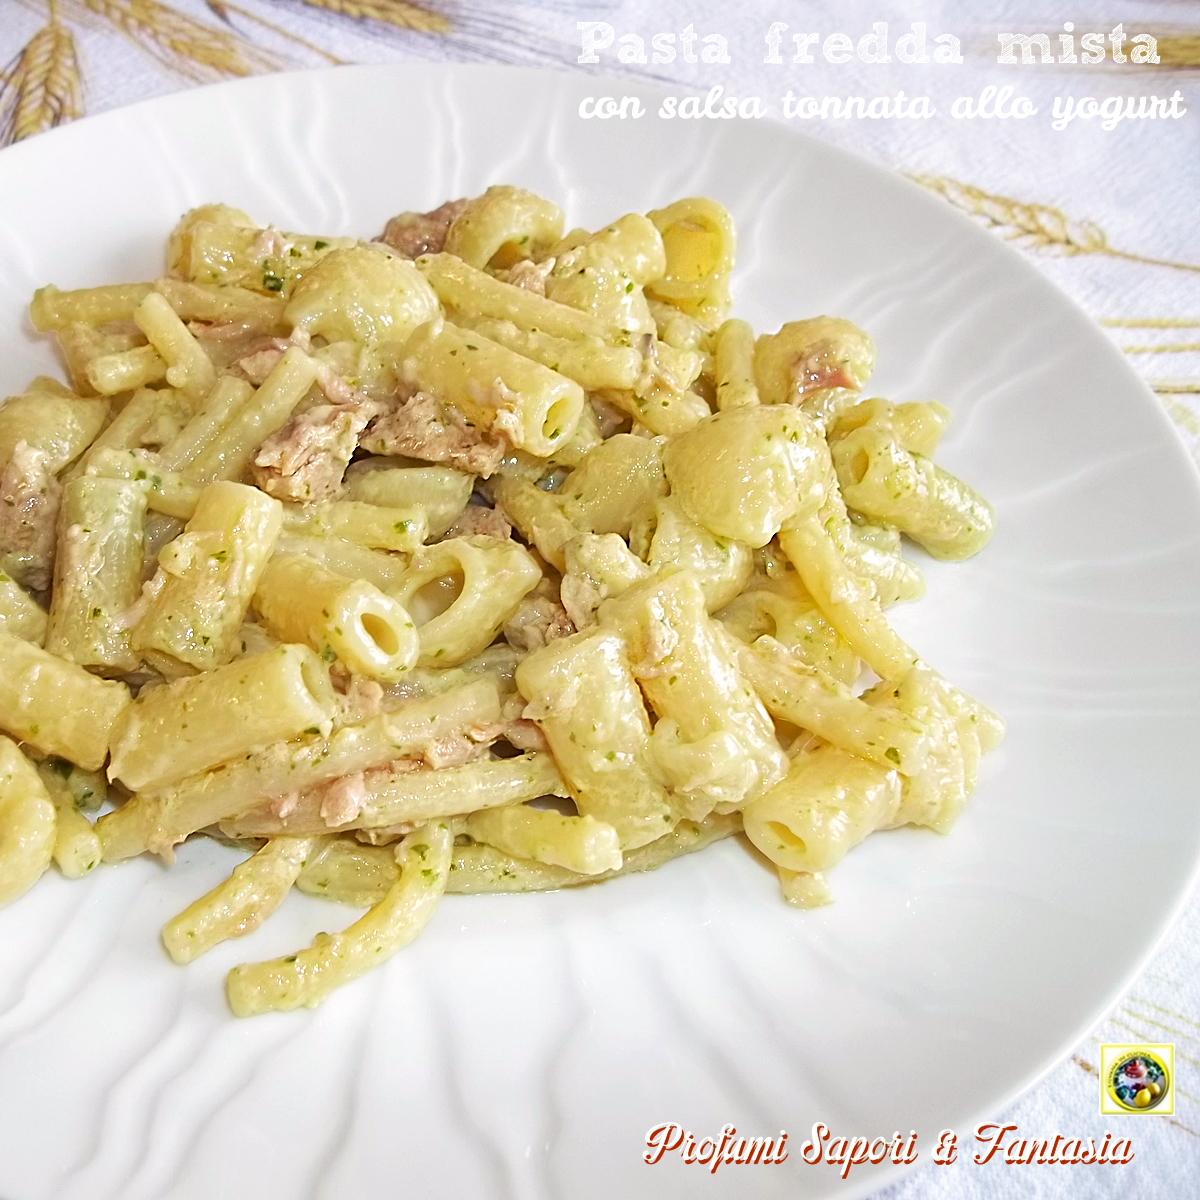 Favori Pasta fredda mista con salsa tonnata allo yogurt PZ83